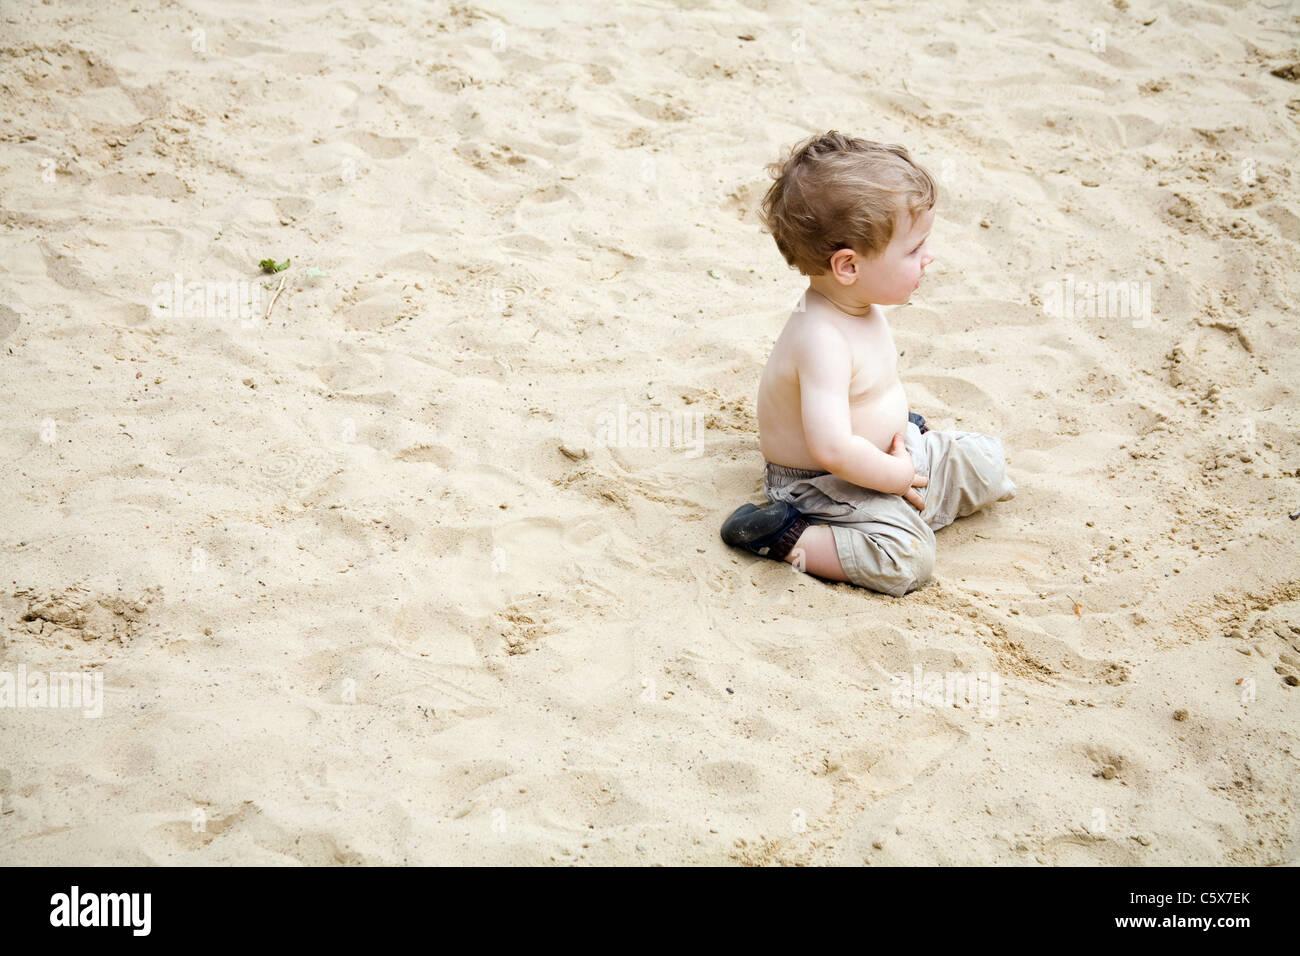 Germany, Berlin, Boy (2-3) sitting in sandbox - Stock Image